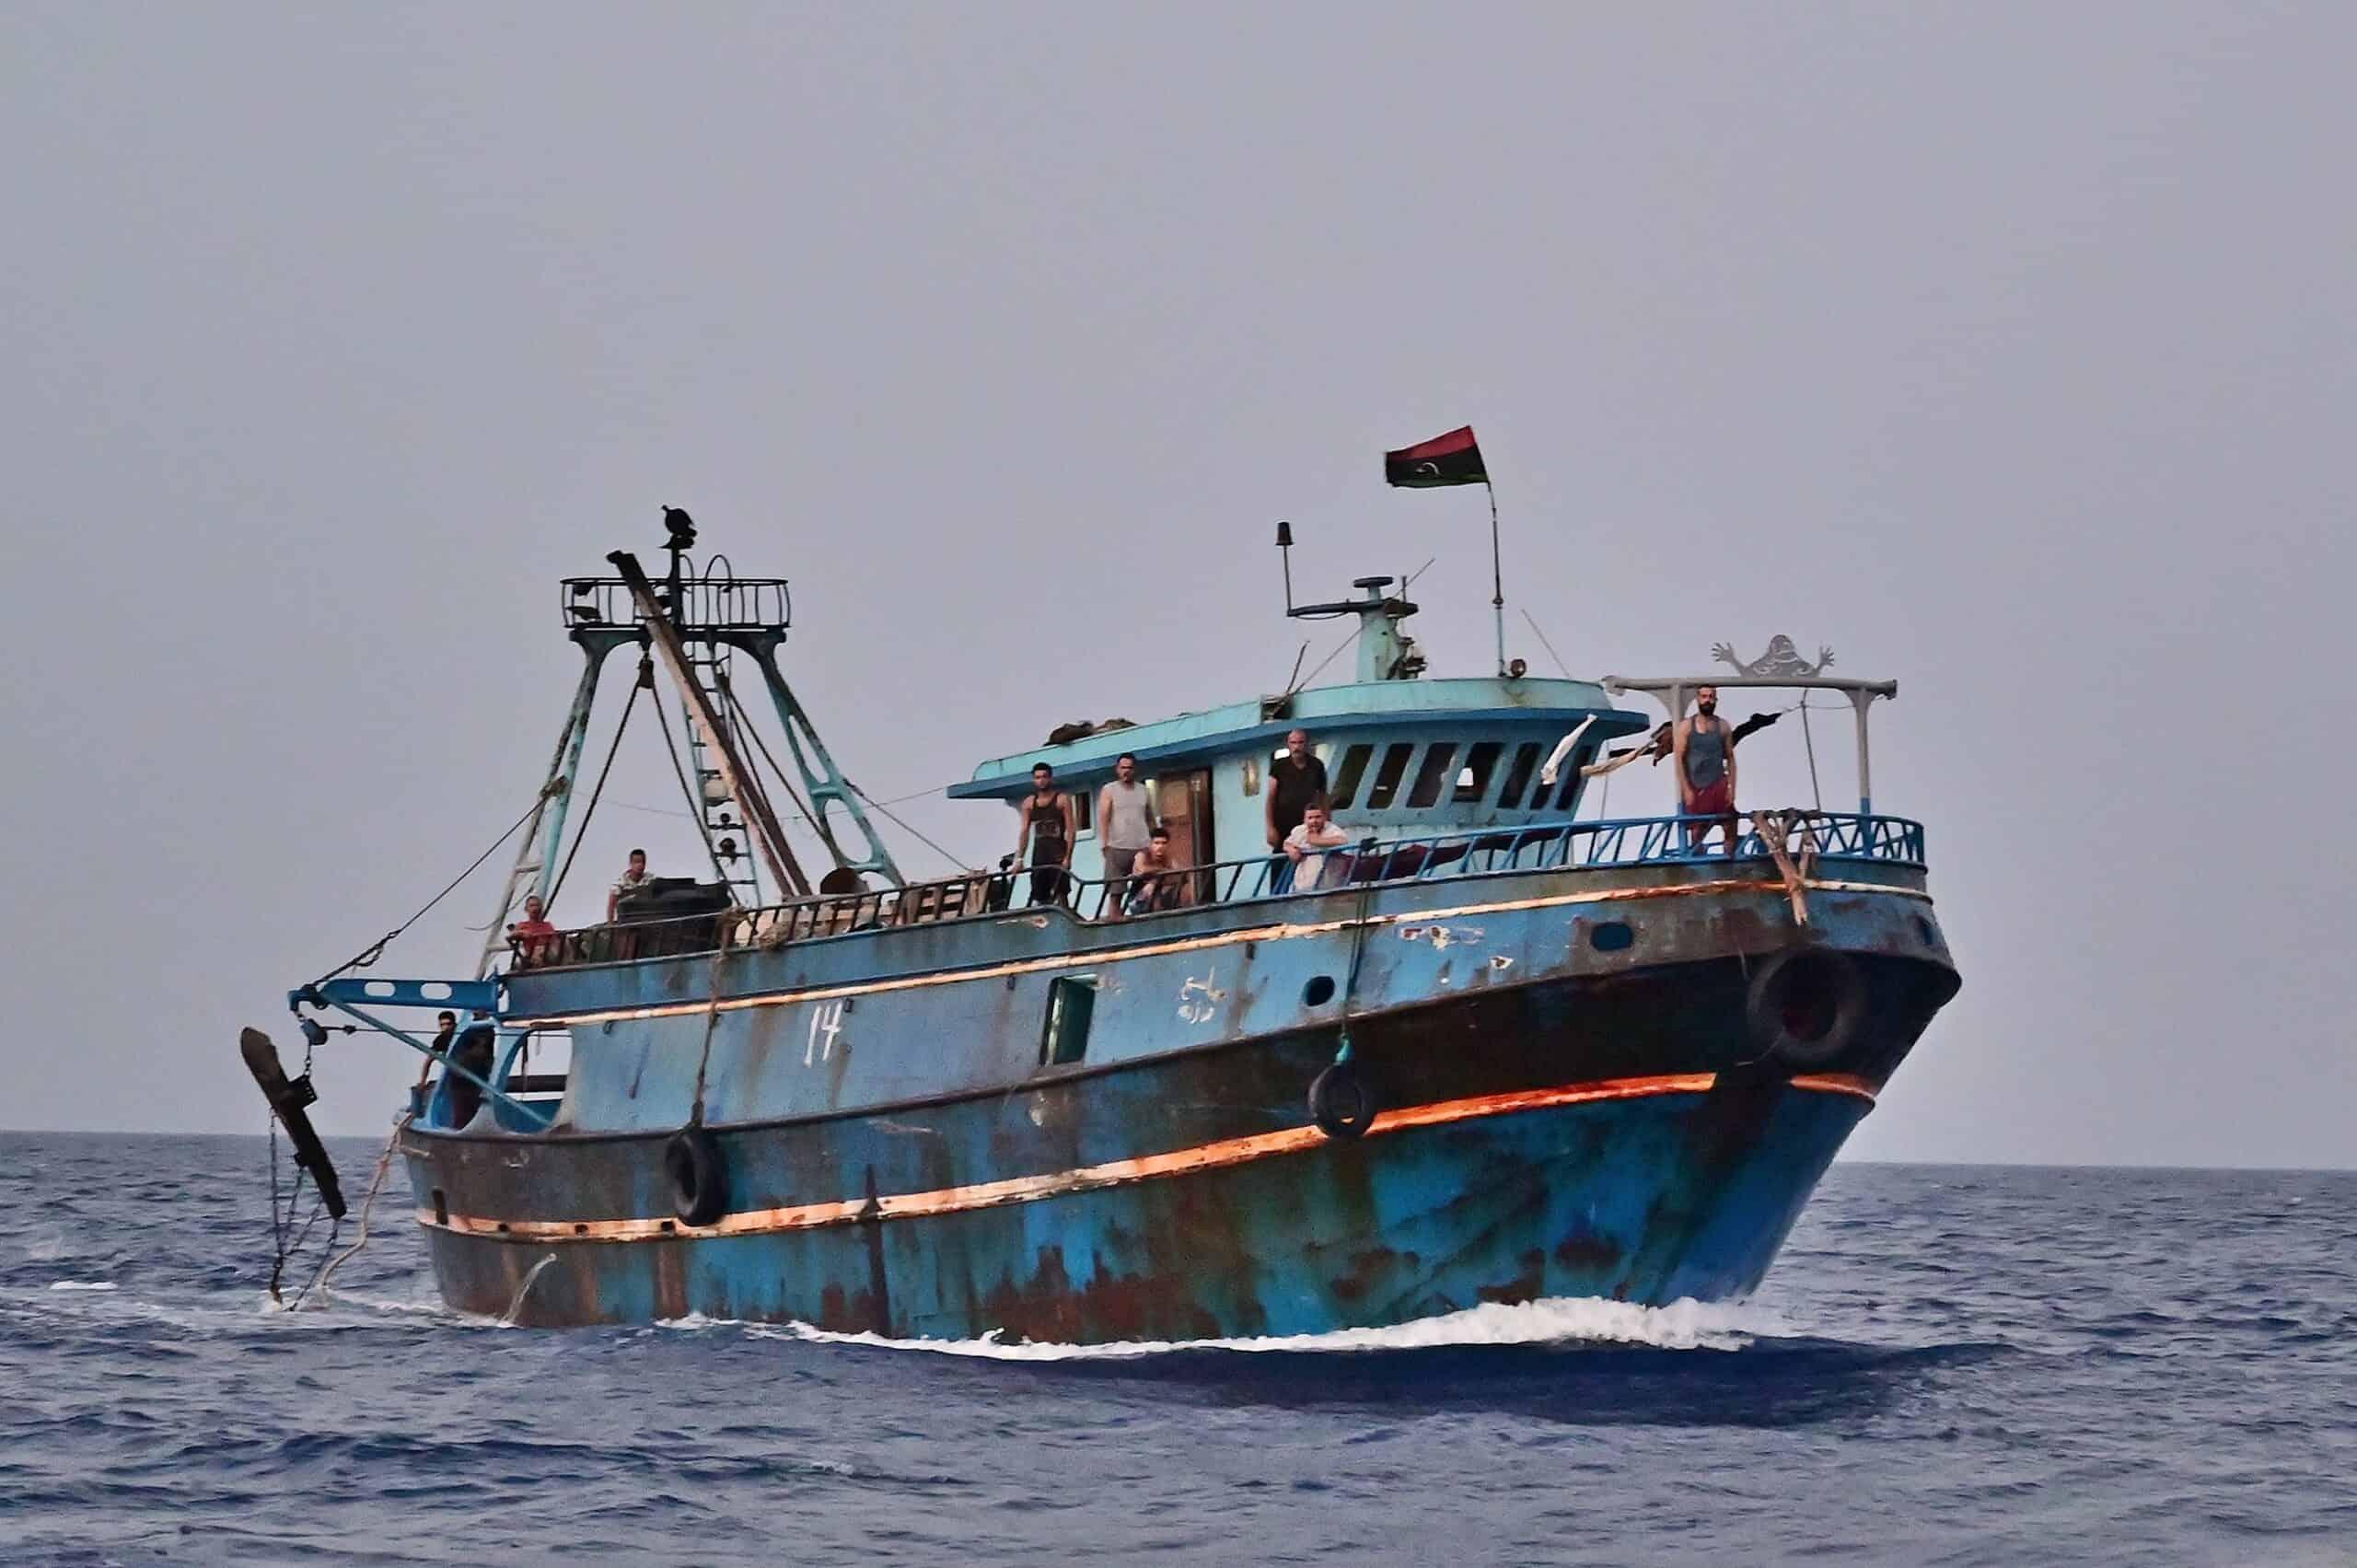 Libyscher Fischkutter